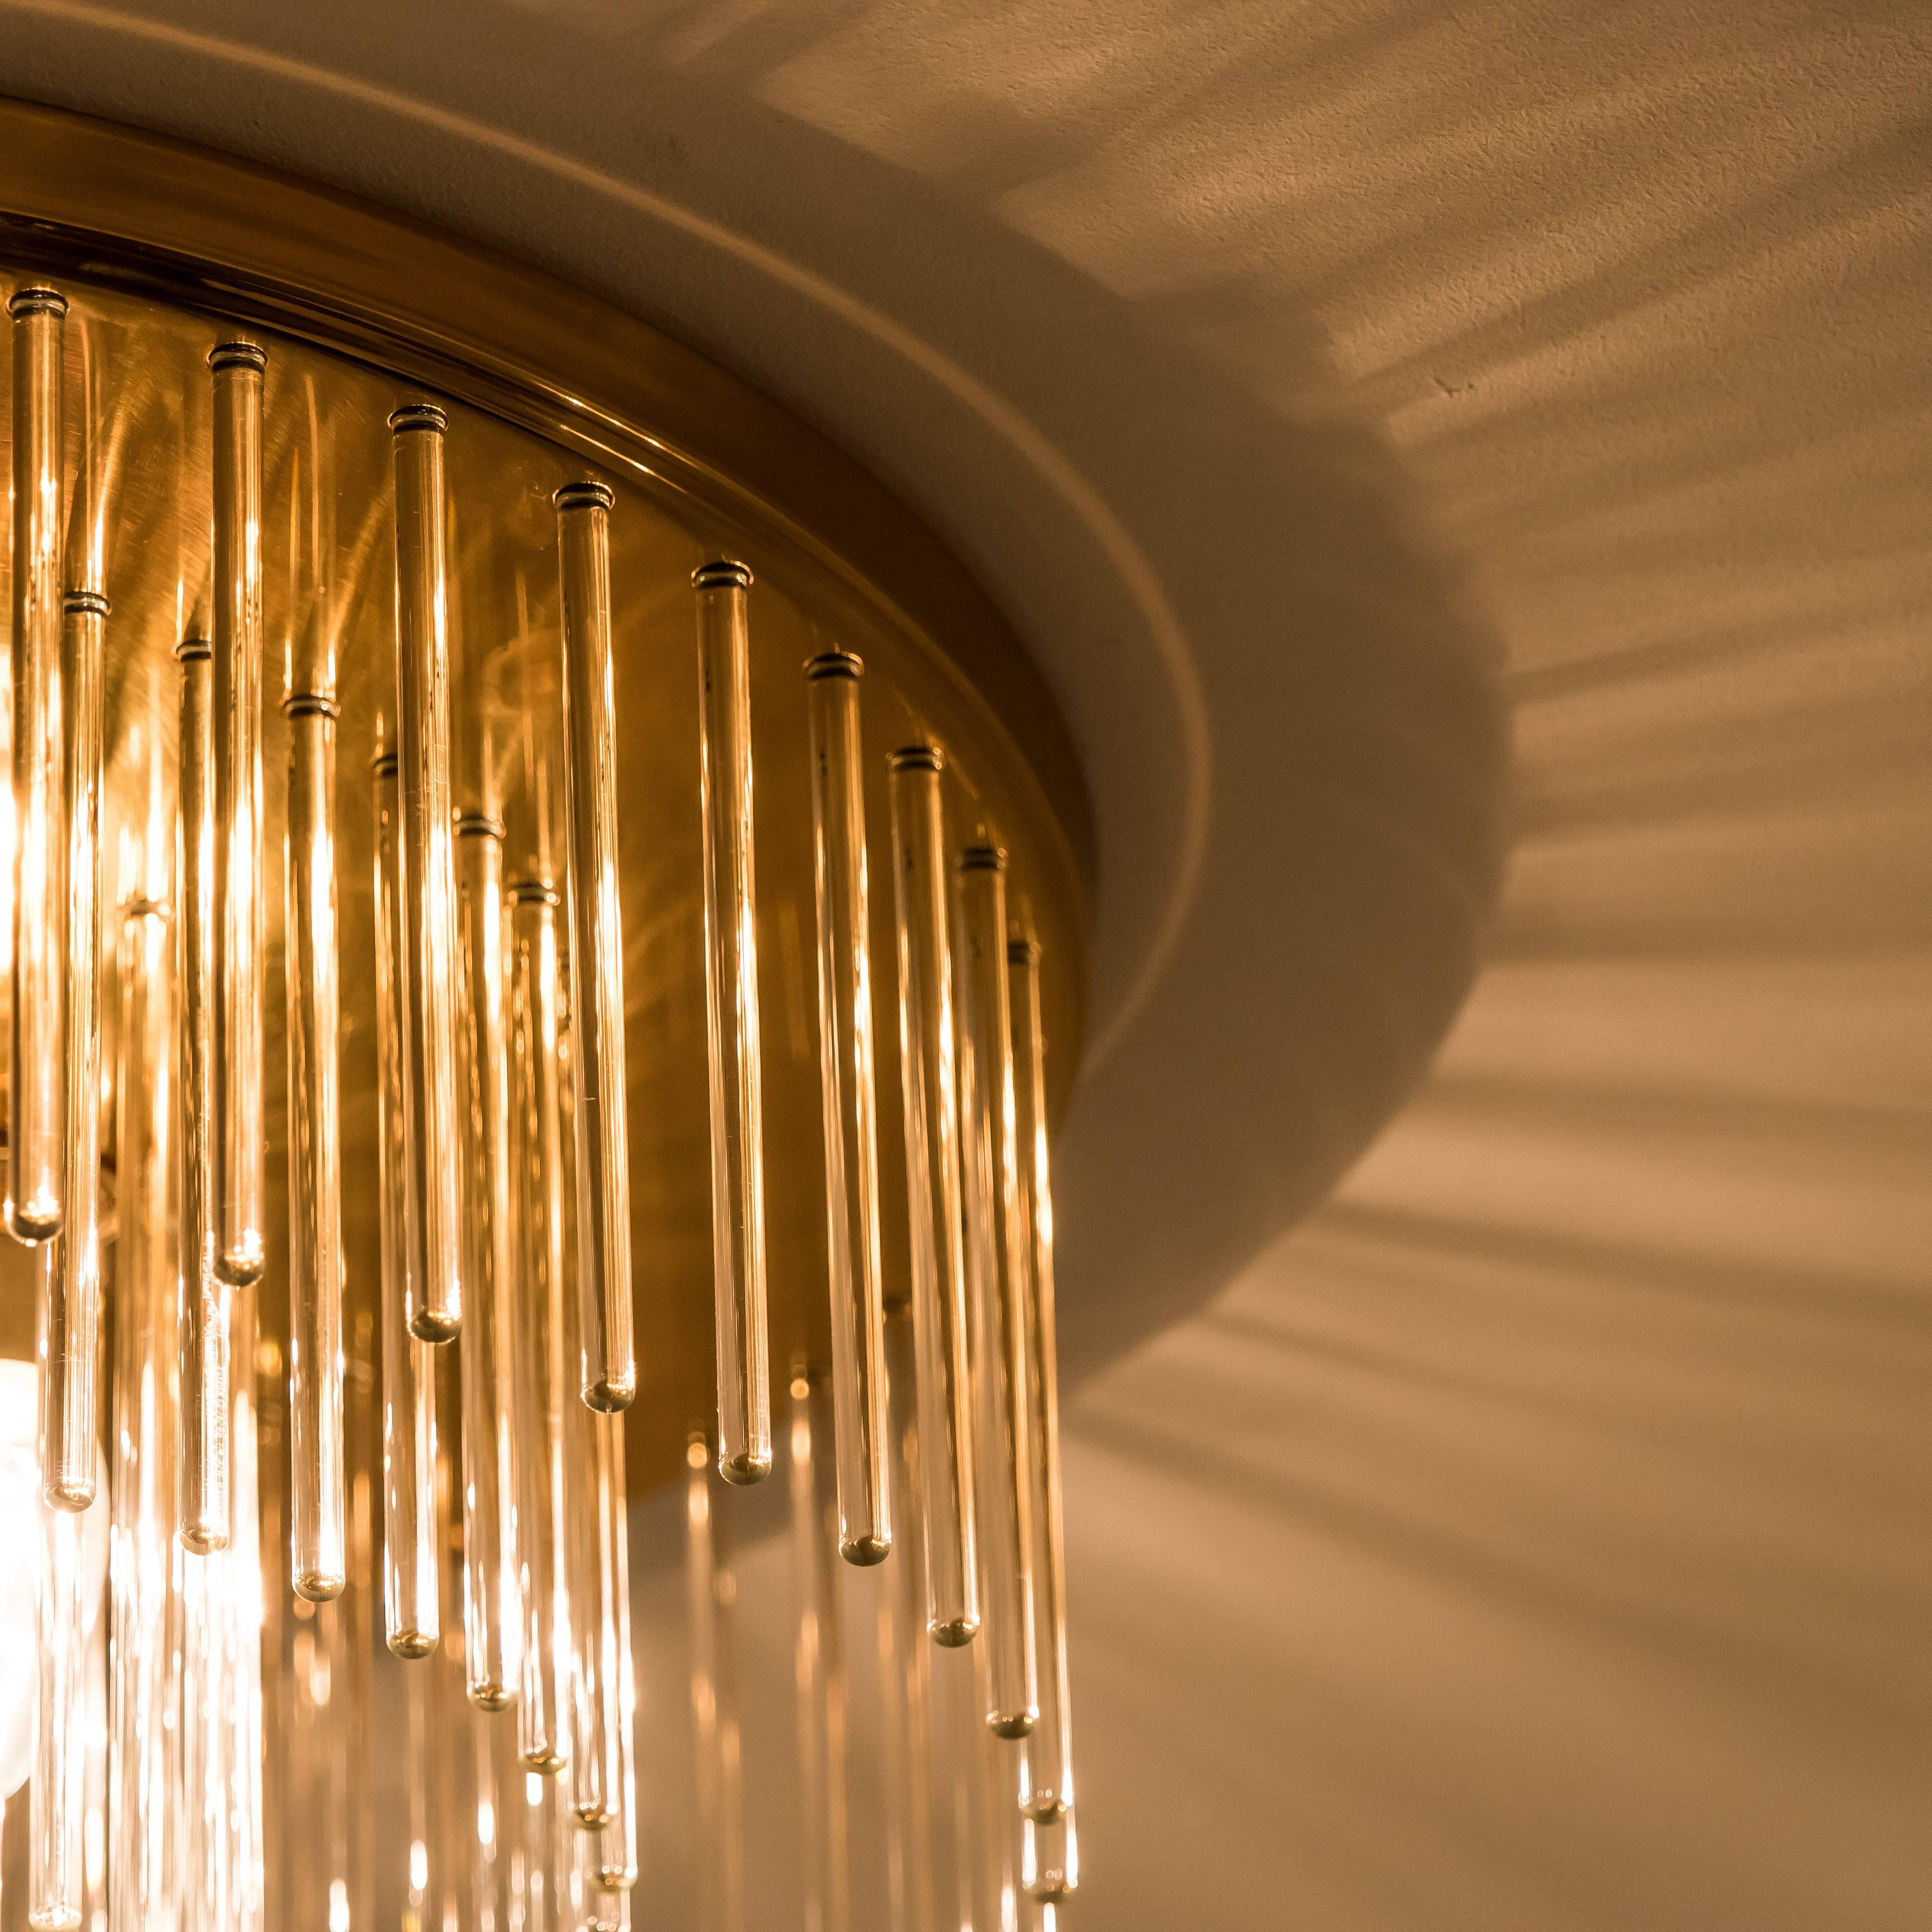 10 1//3 Hillebrand  Wandlampe Wall  SCONCE  wall lamp Glas Orange  Murano